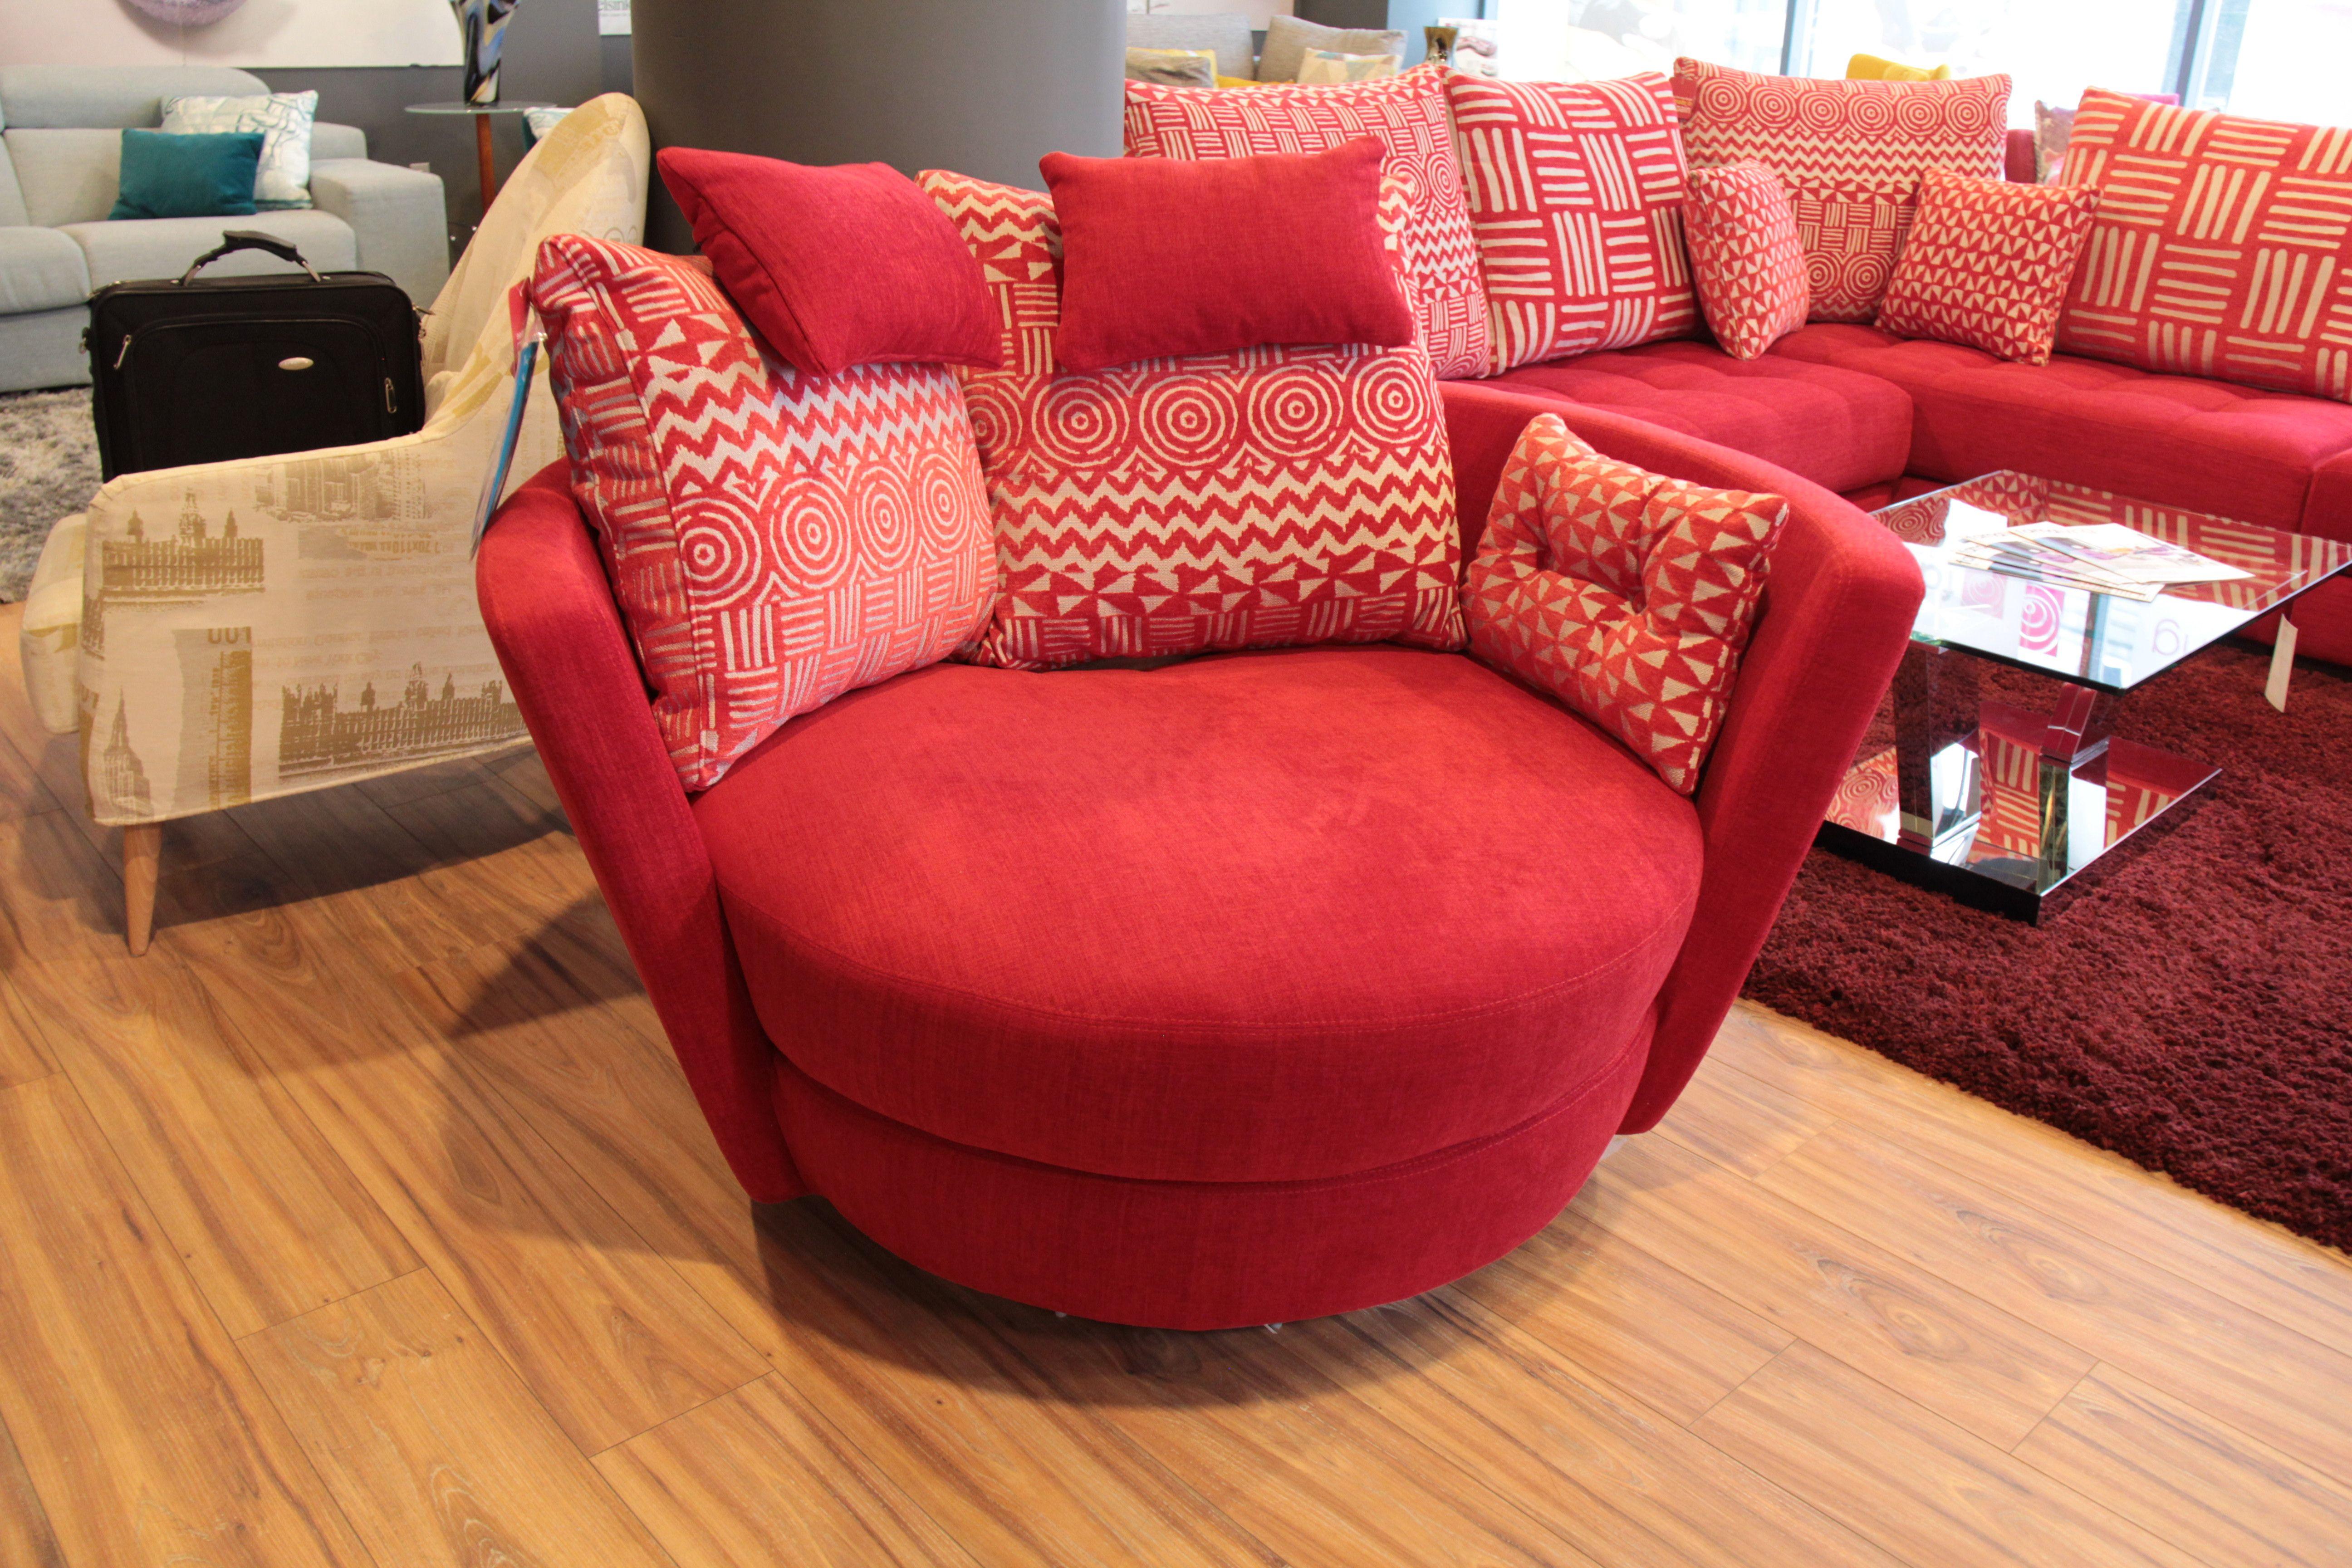 Fine My Nest Swivel Double Chair By Fama 2000 Boul St Laurent Uwap Interior Chair Design Uwaporg